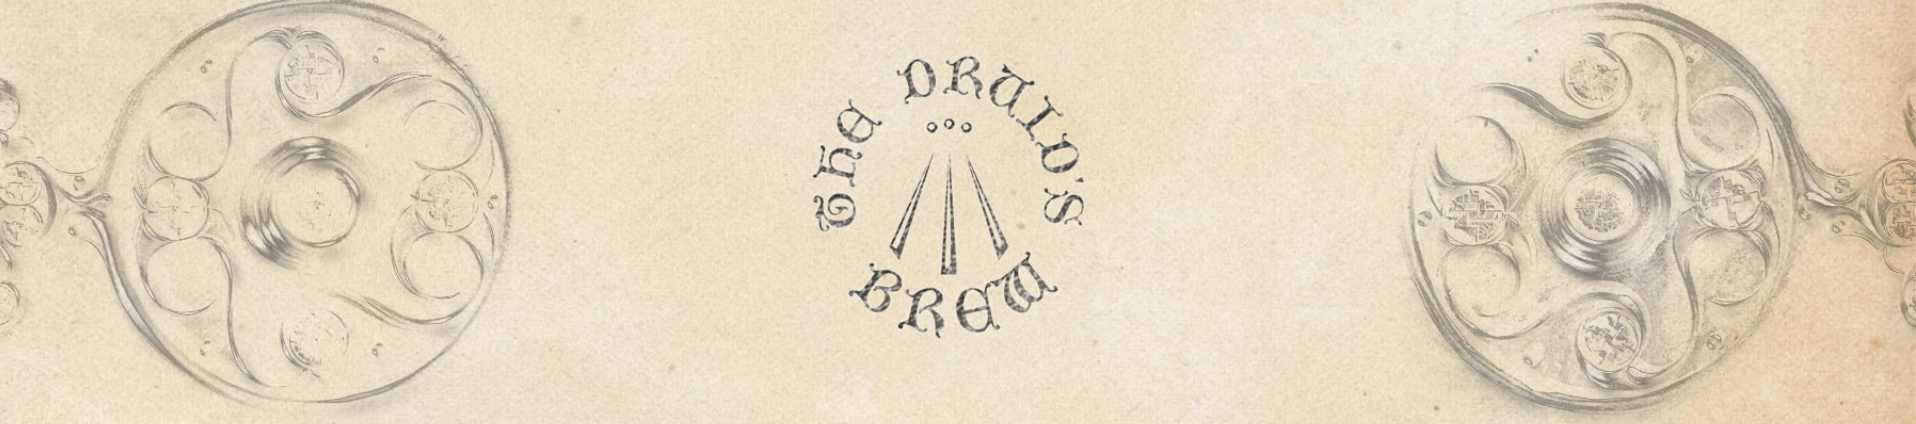 The Druid's Brew